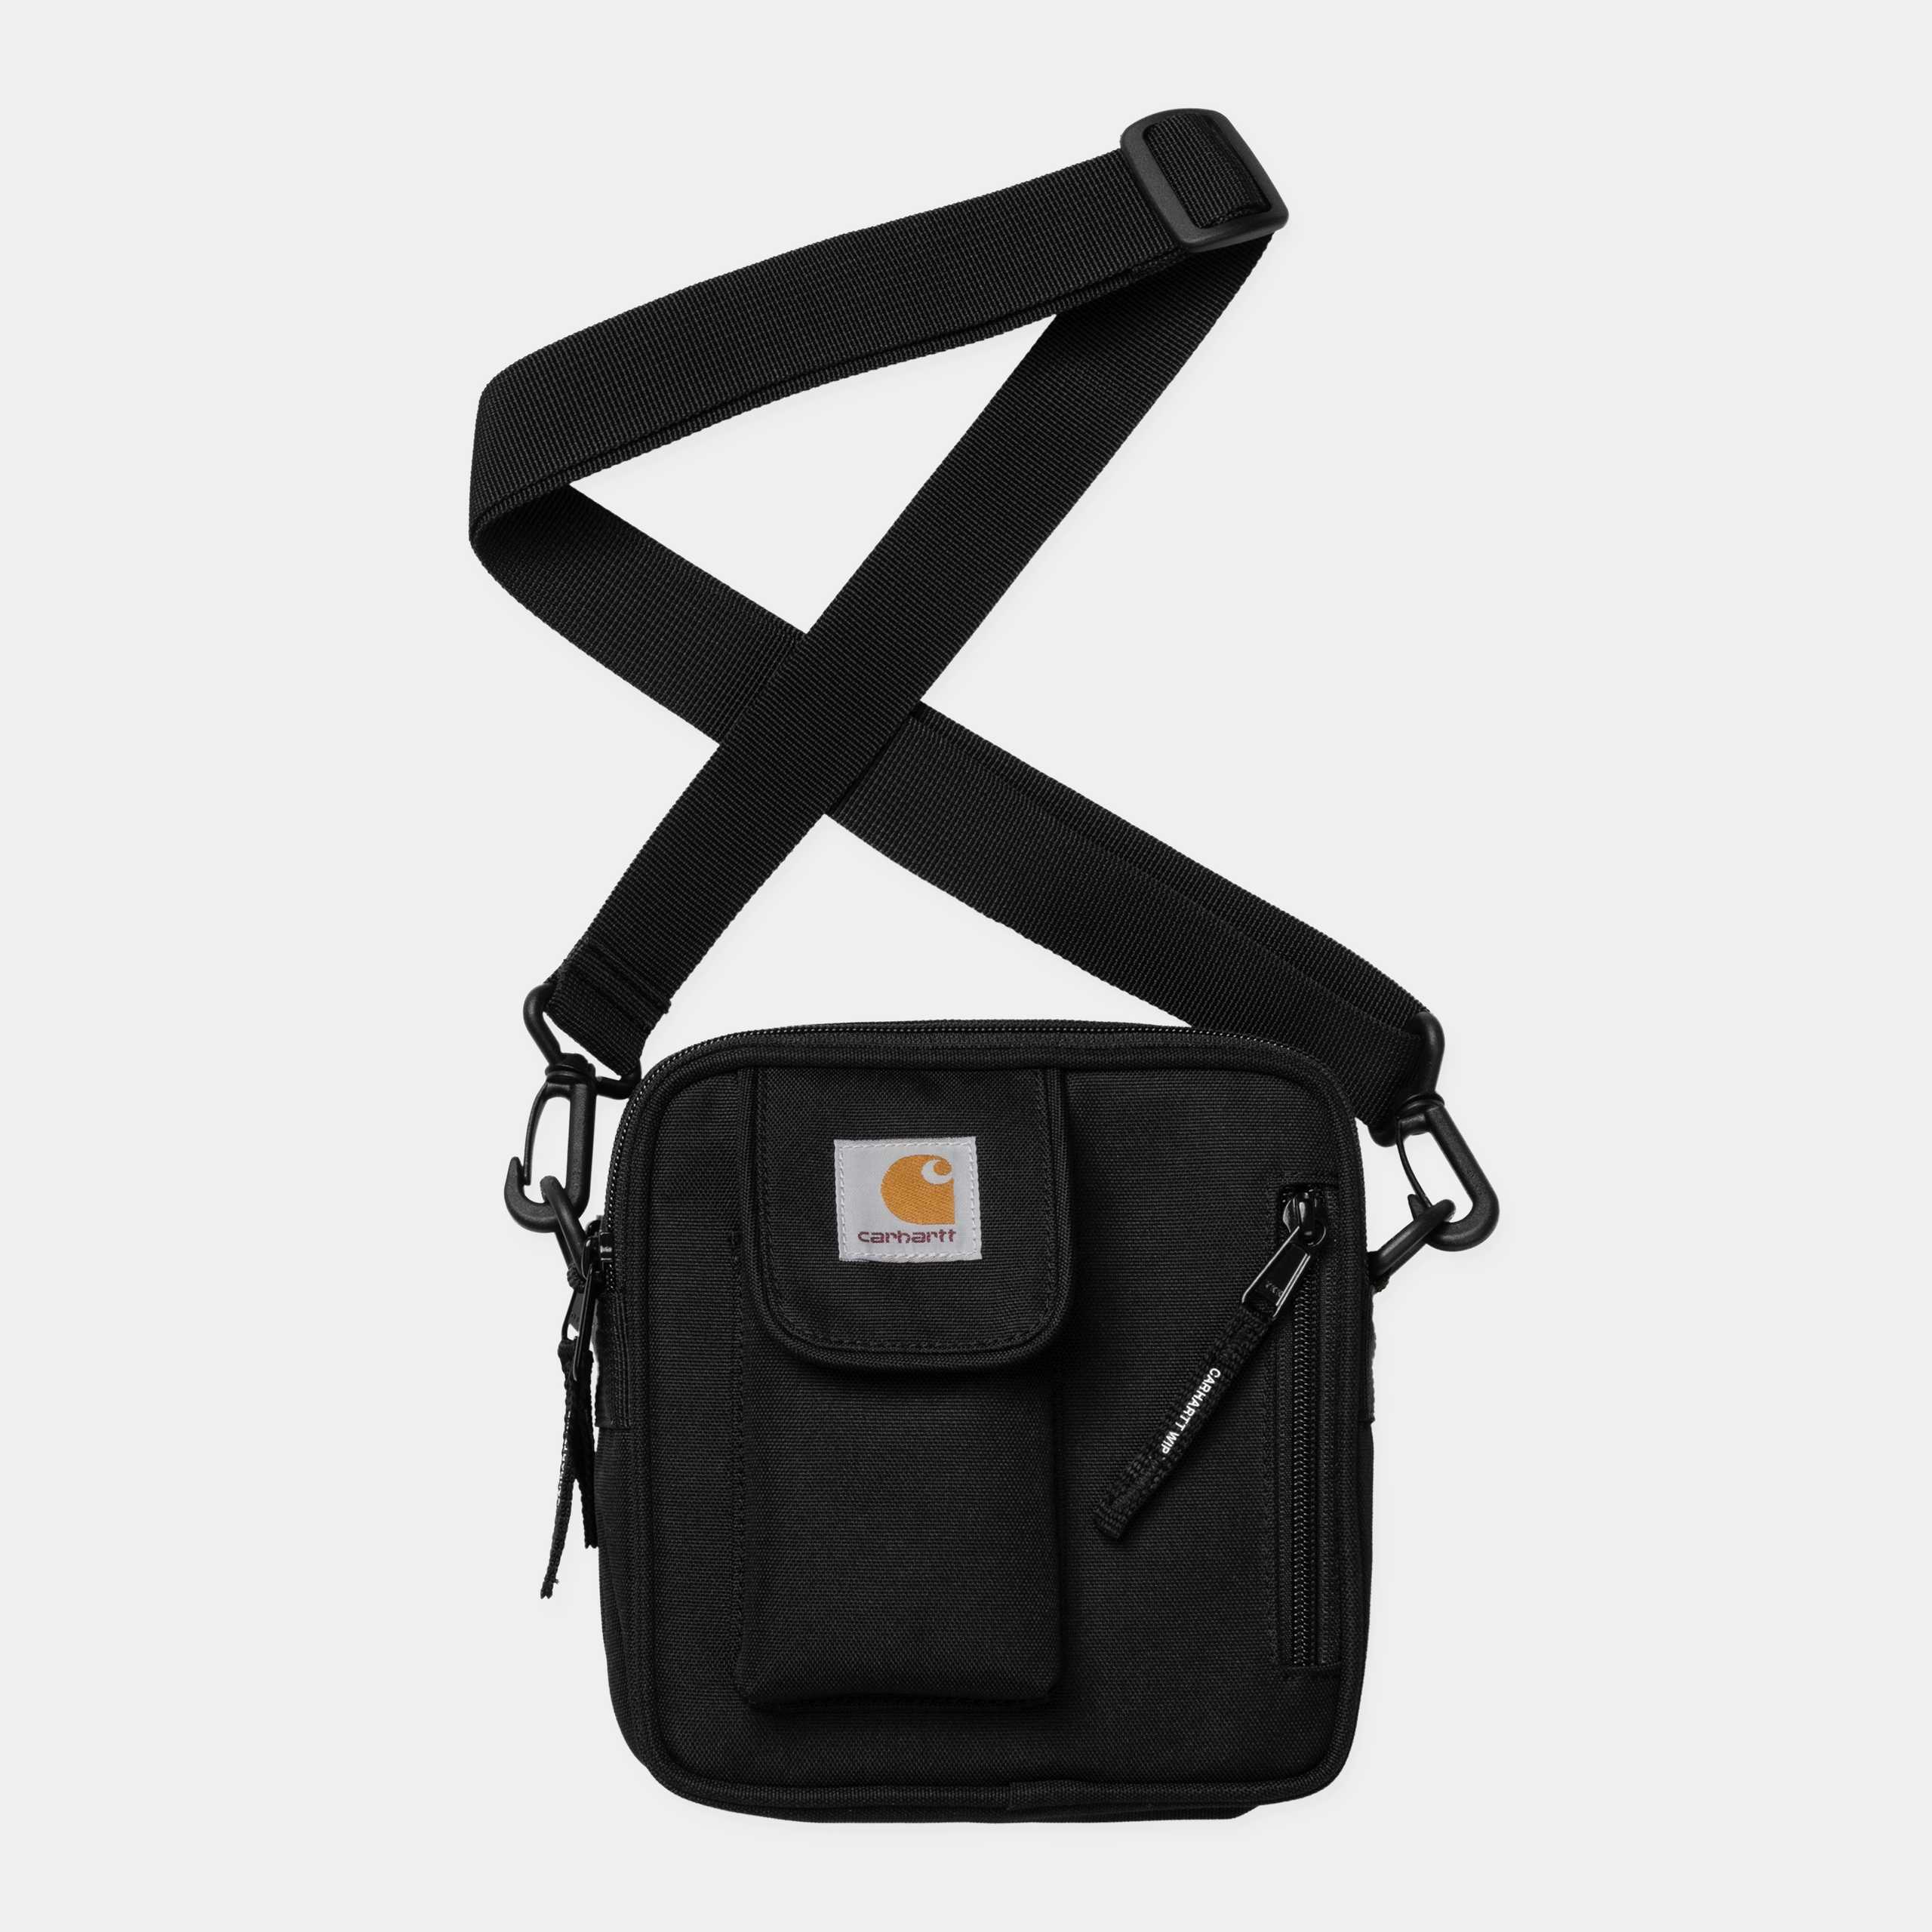 Carhartt WIP - ESSENTIALS BAG SMALL - Black